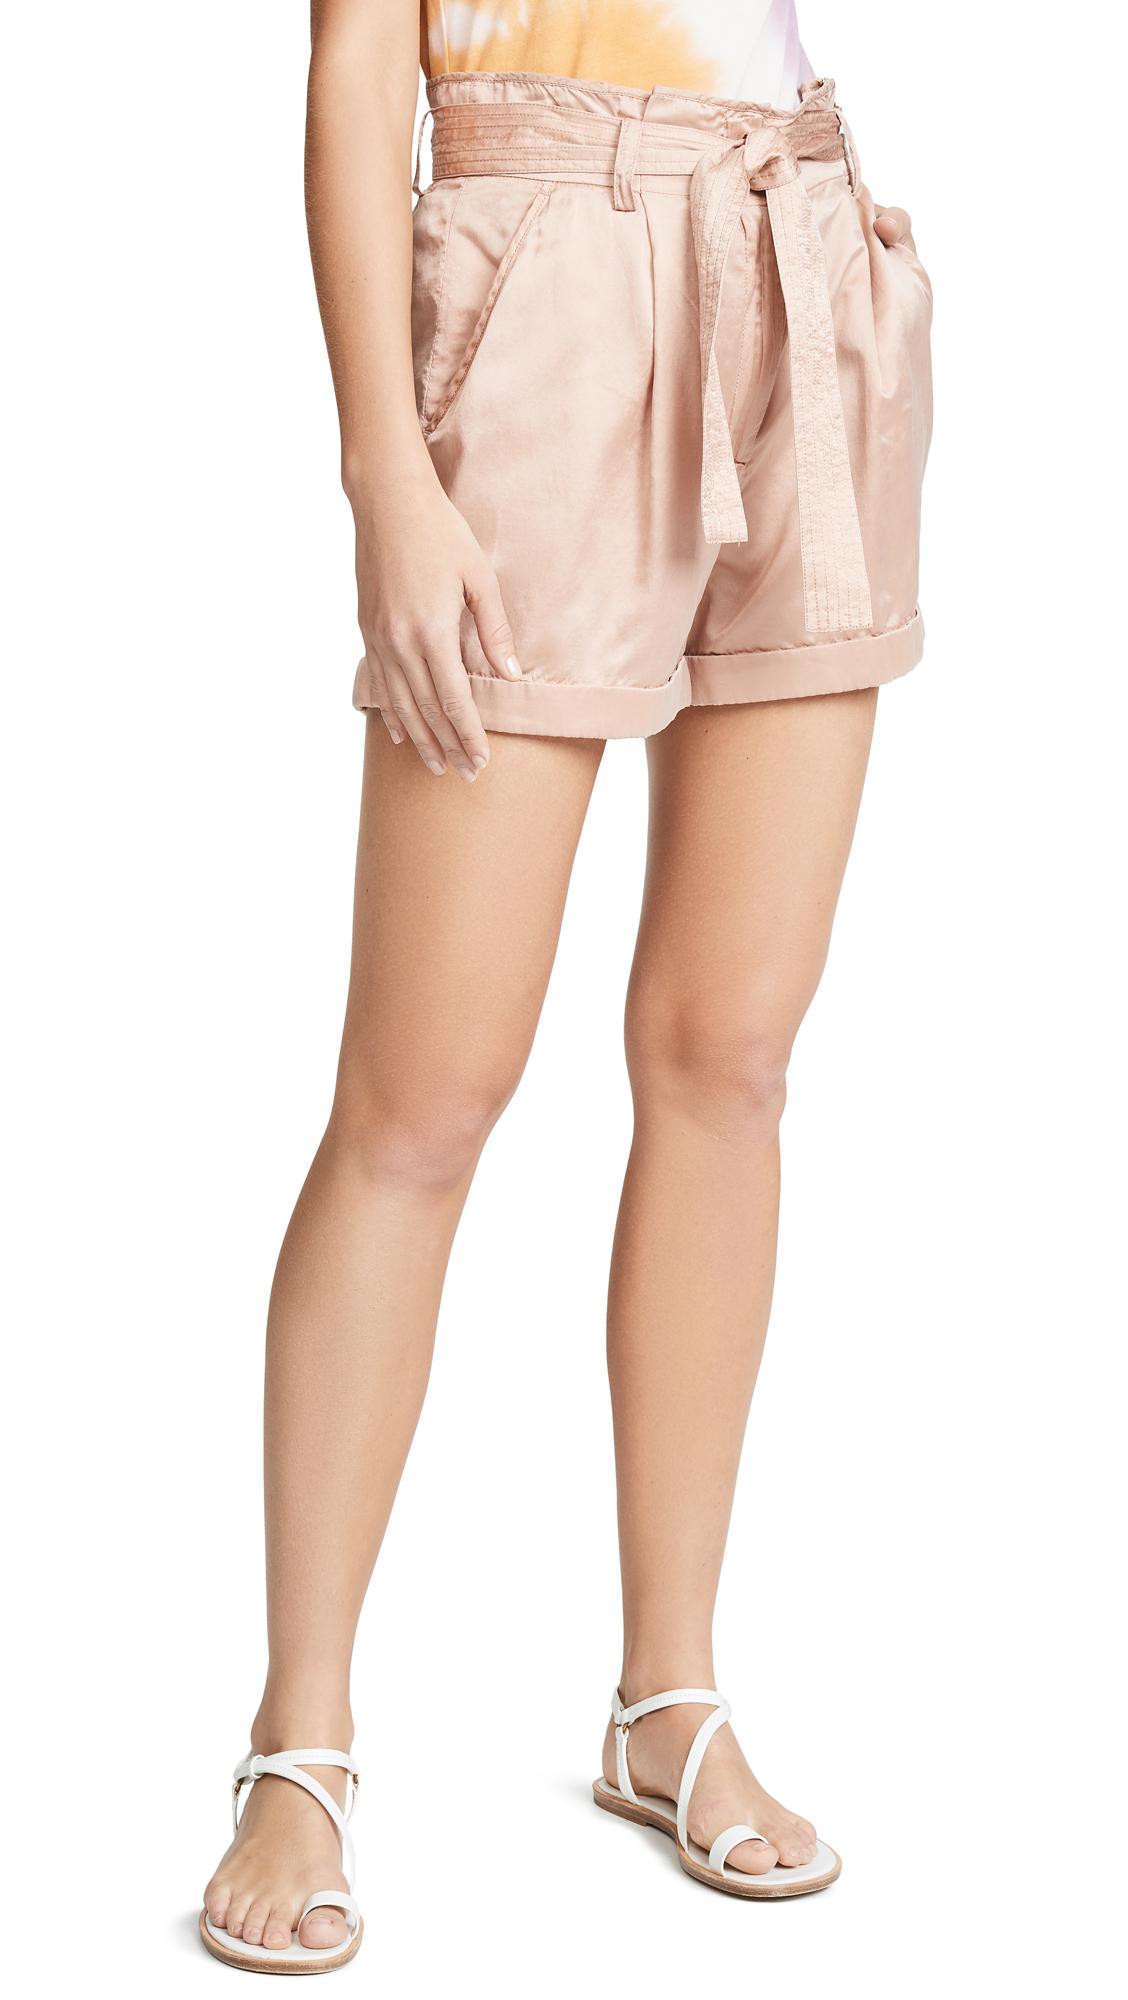 A.L.C. Merrick Shorts - Dusty Rose